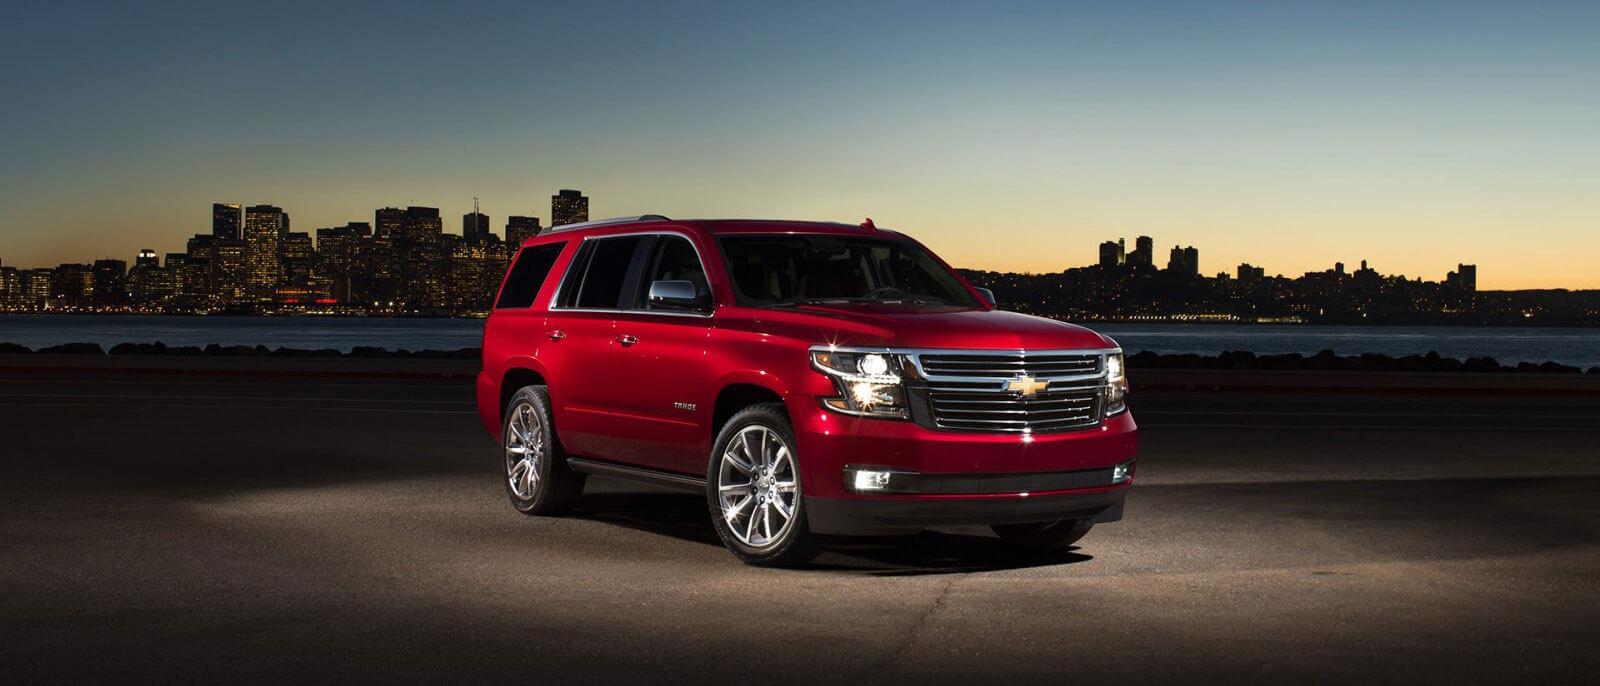 Chevy Tahoe Mpg >> 2017 Chevrolet Tahoe Model Info Price Mpg Performance More